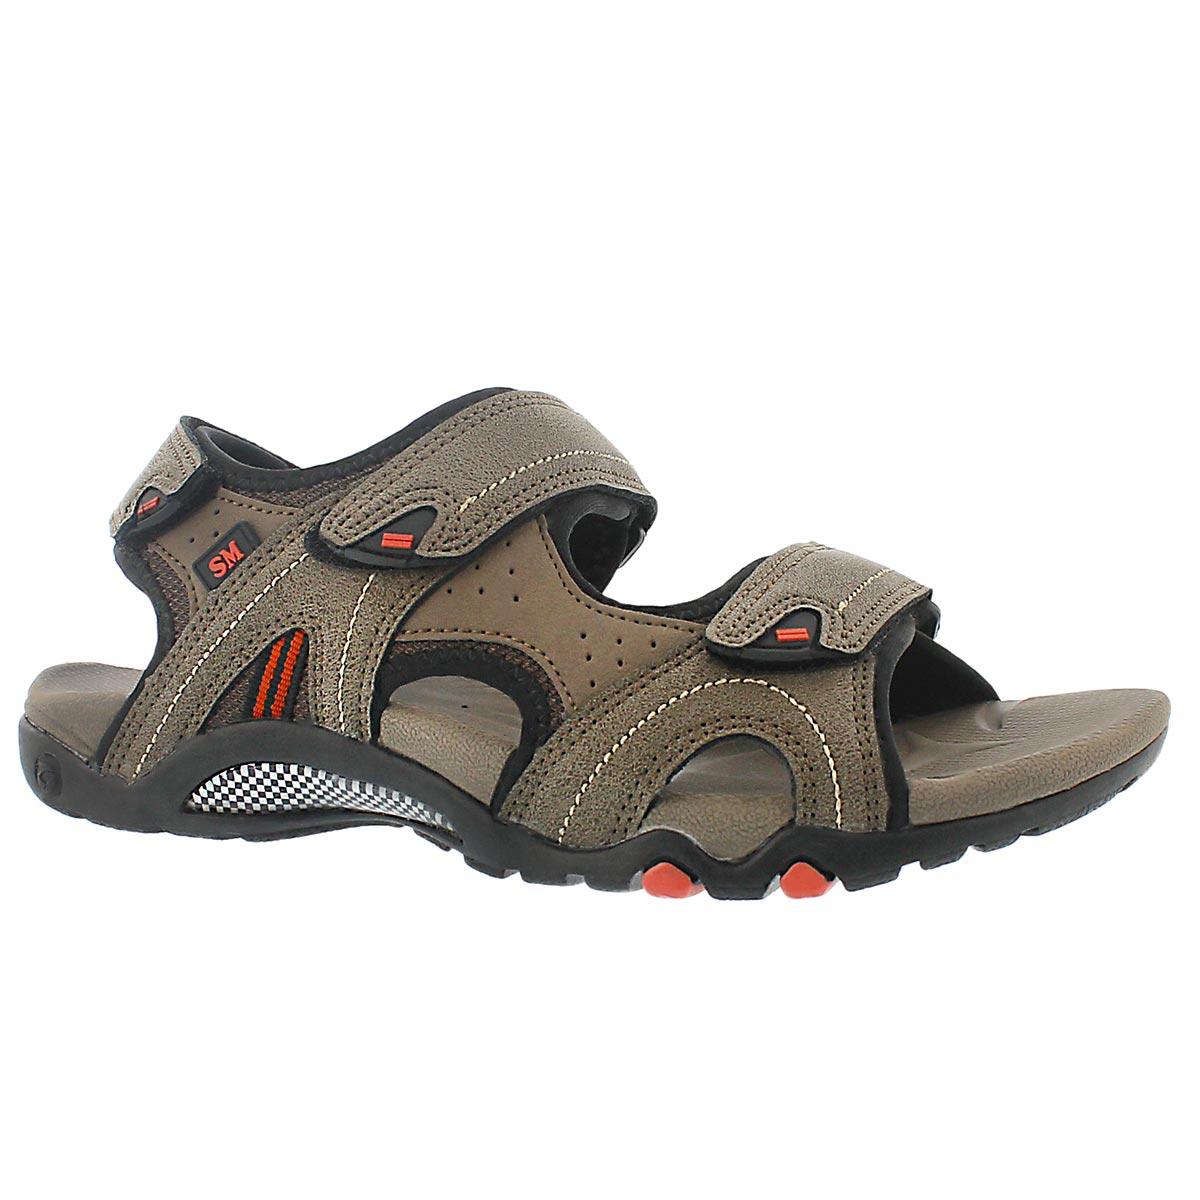 Mns Keegan taupe 3 strap sport sandal